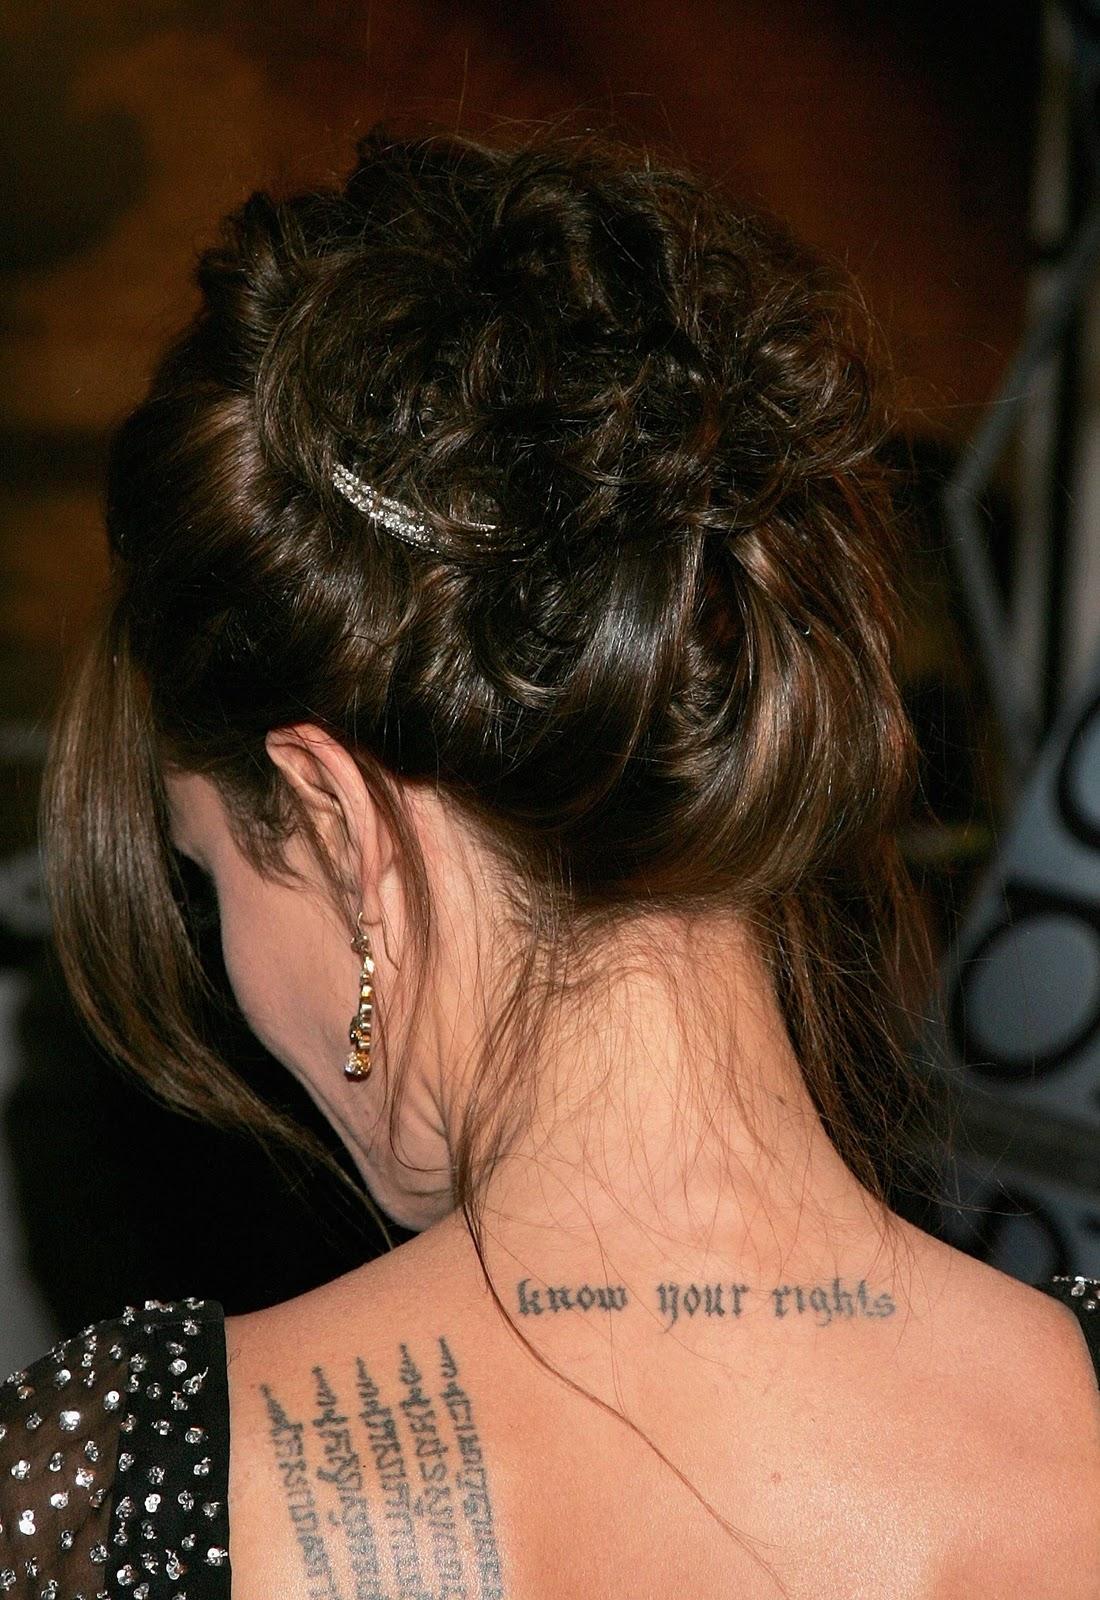 Angelina Jolie-Voight: TATTOOS   Polski blog